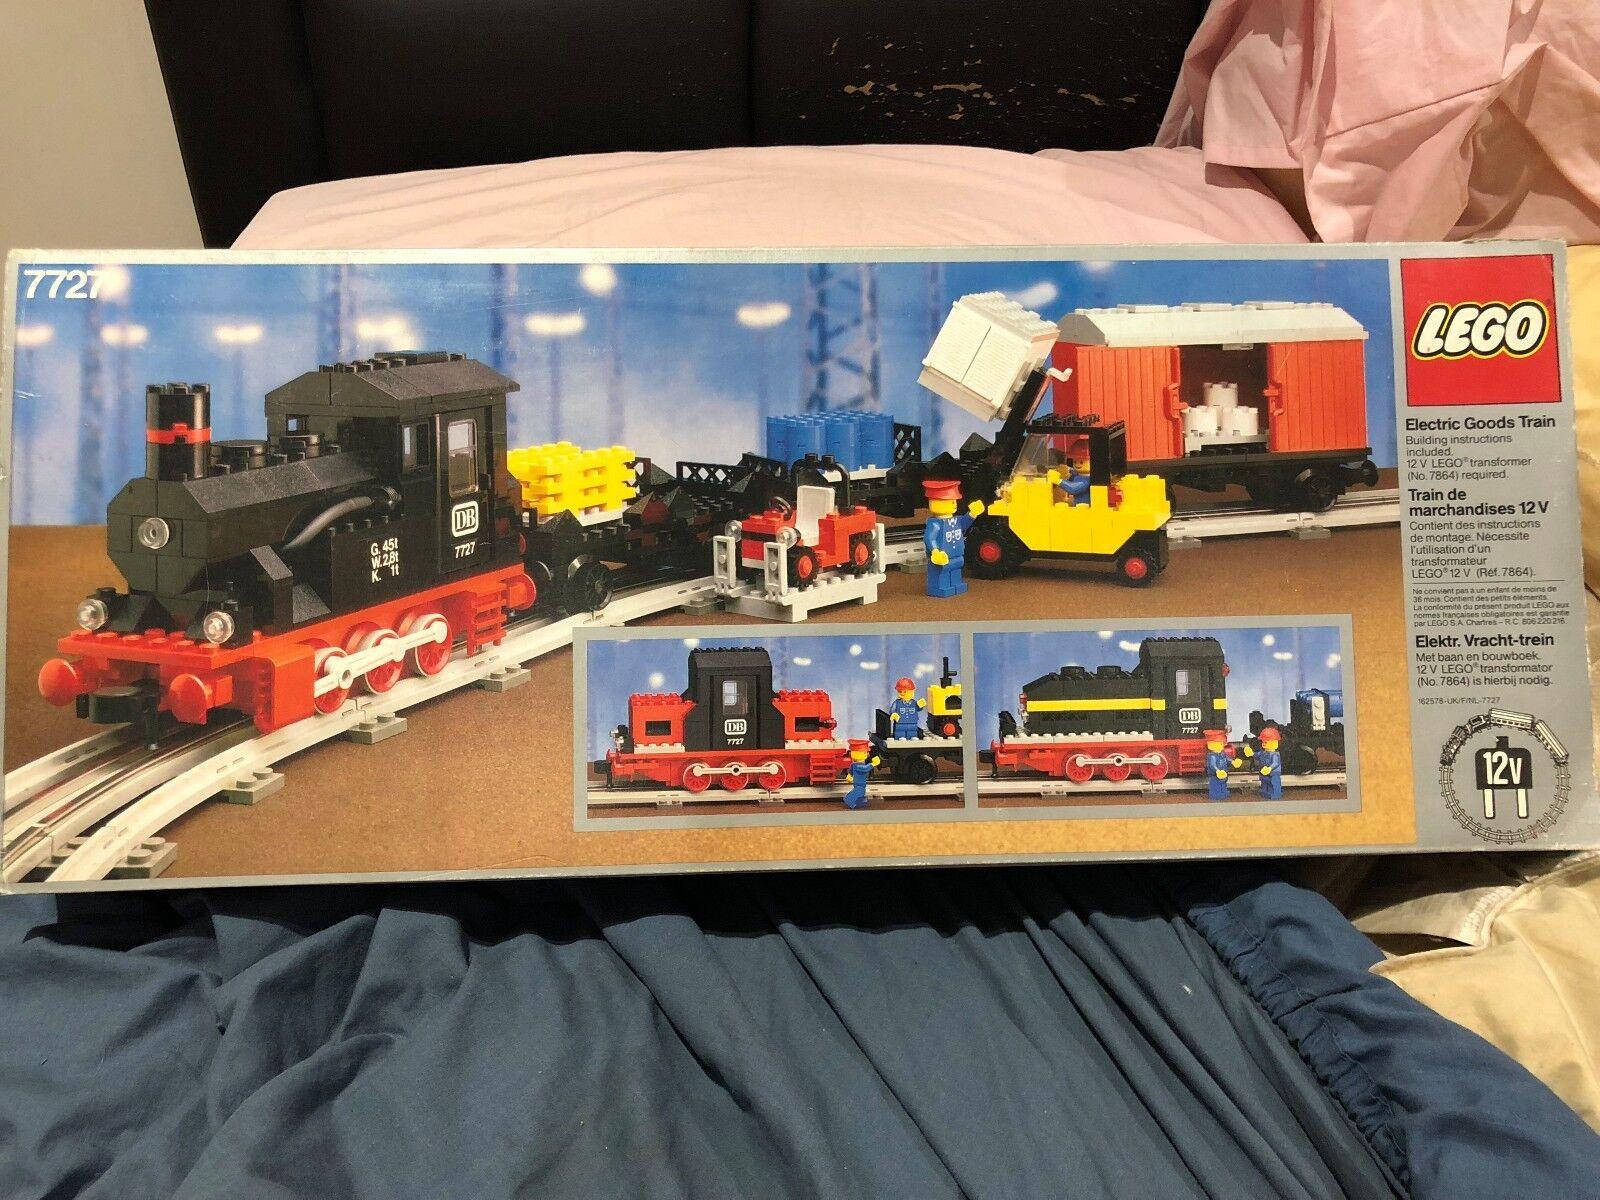 Brand Nuovo Nuovo Nuovo 7727 Lego Train Set- Never been